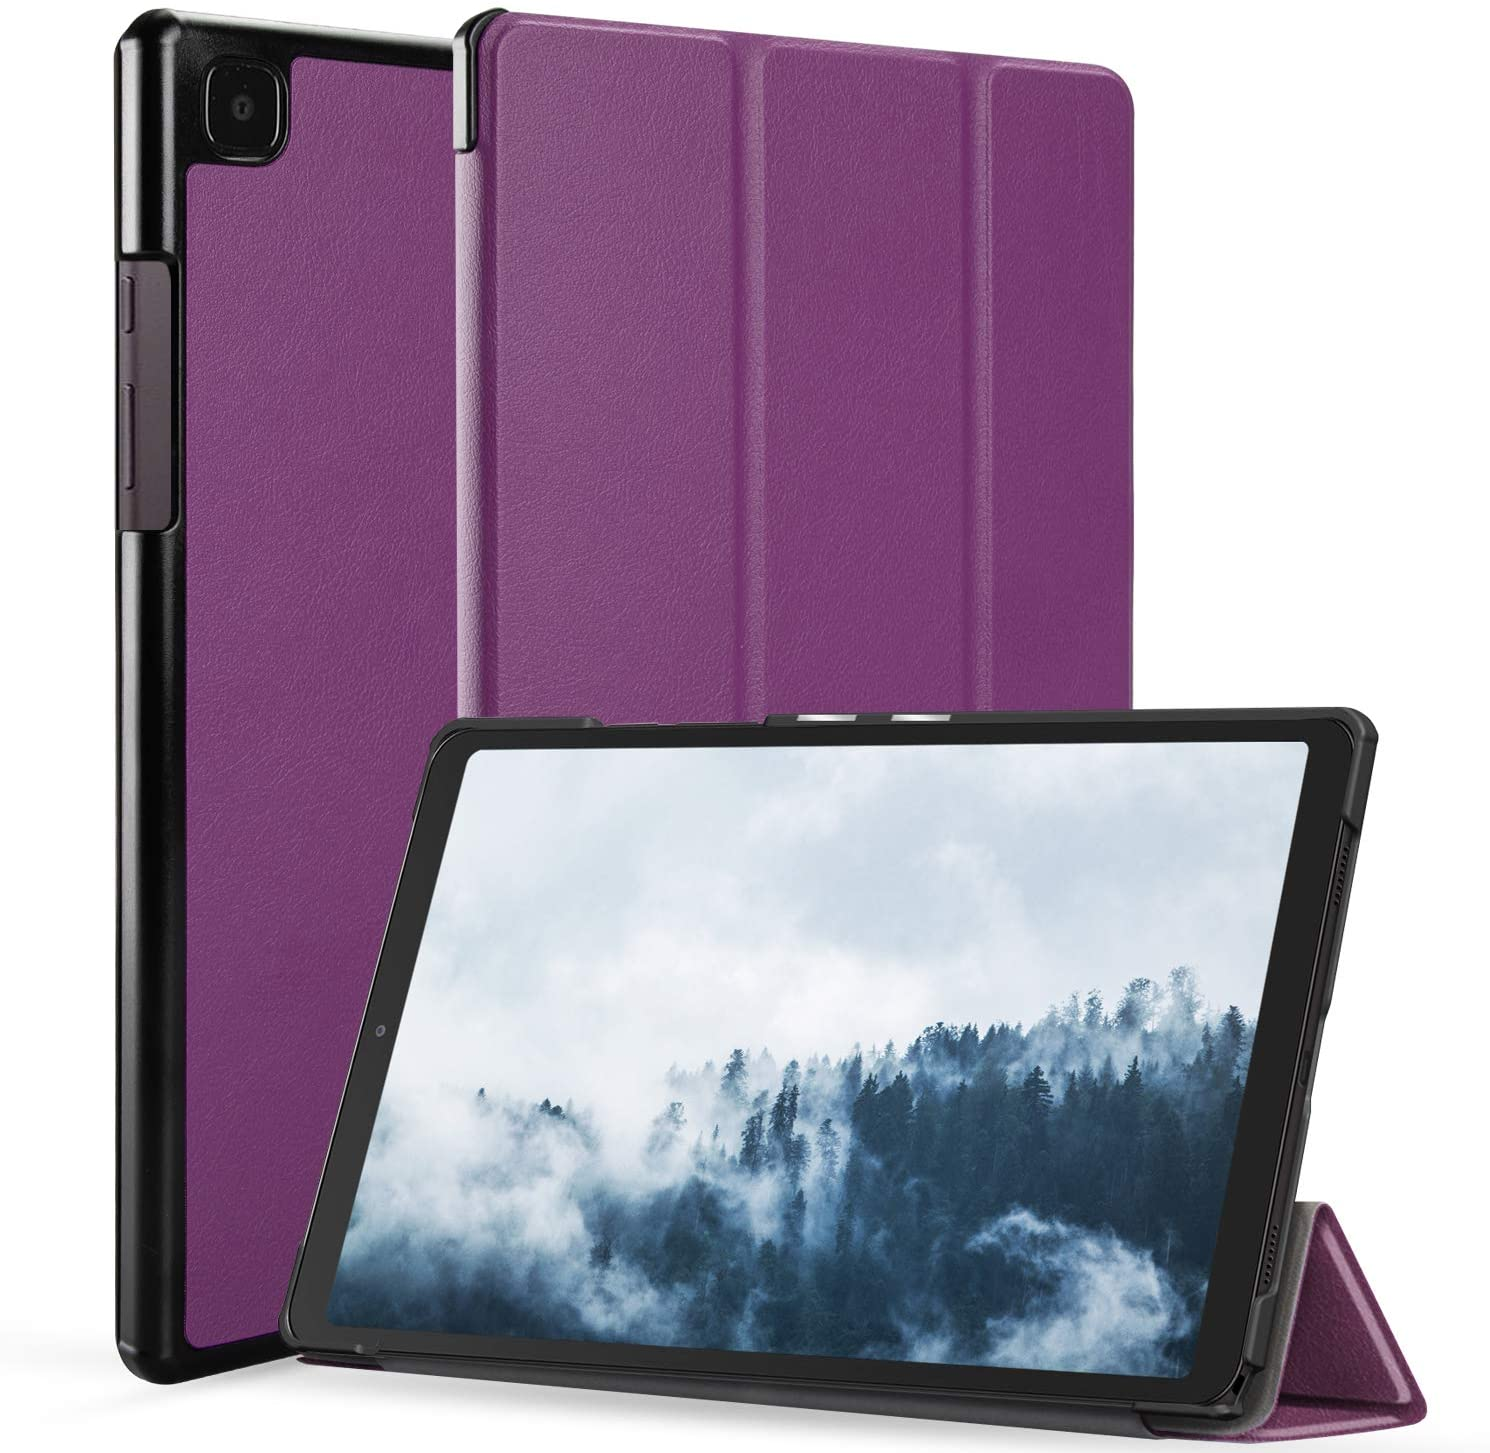 Neepanda Case for Samsung Galaxy Tab A7 10.4 Inch 2020, Slim Tri-Fold Shell Case Cover for Samsung Galaxy Tab A7 10.4 Inch Model SM-T500/T505/T507 2020 Release, [Auto Wake/Sleep] - Purple